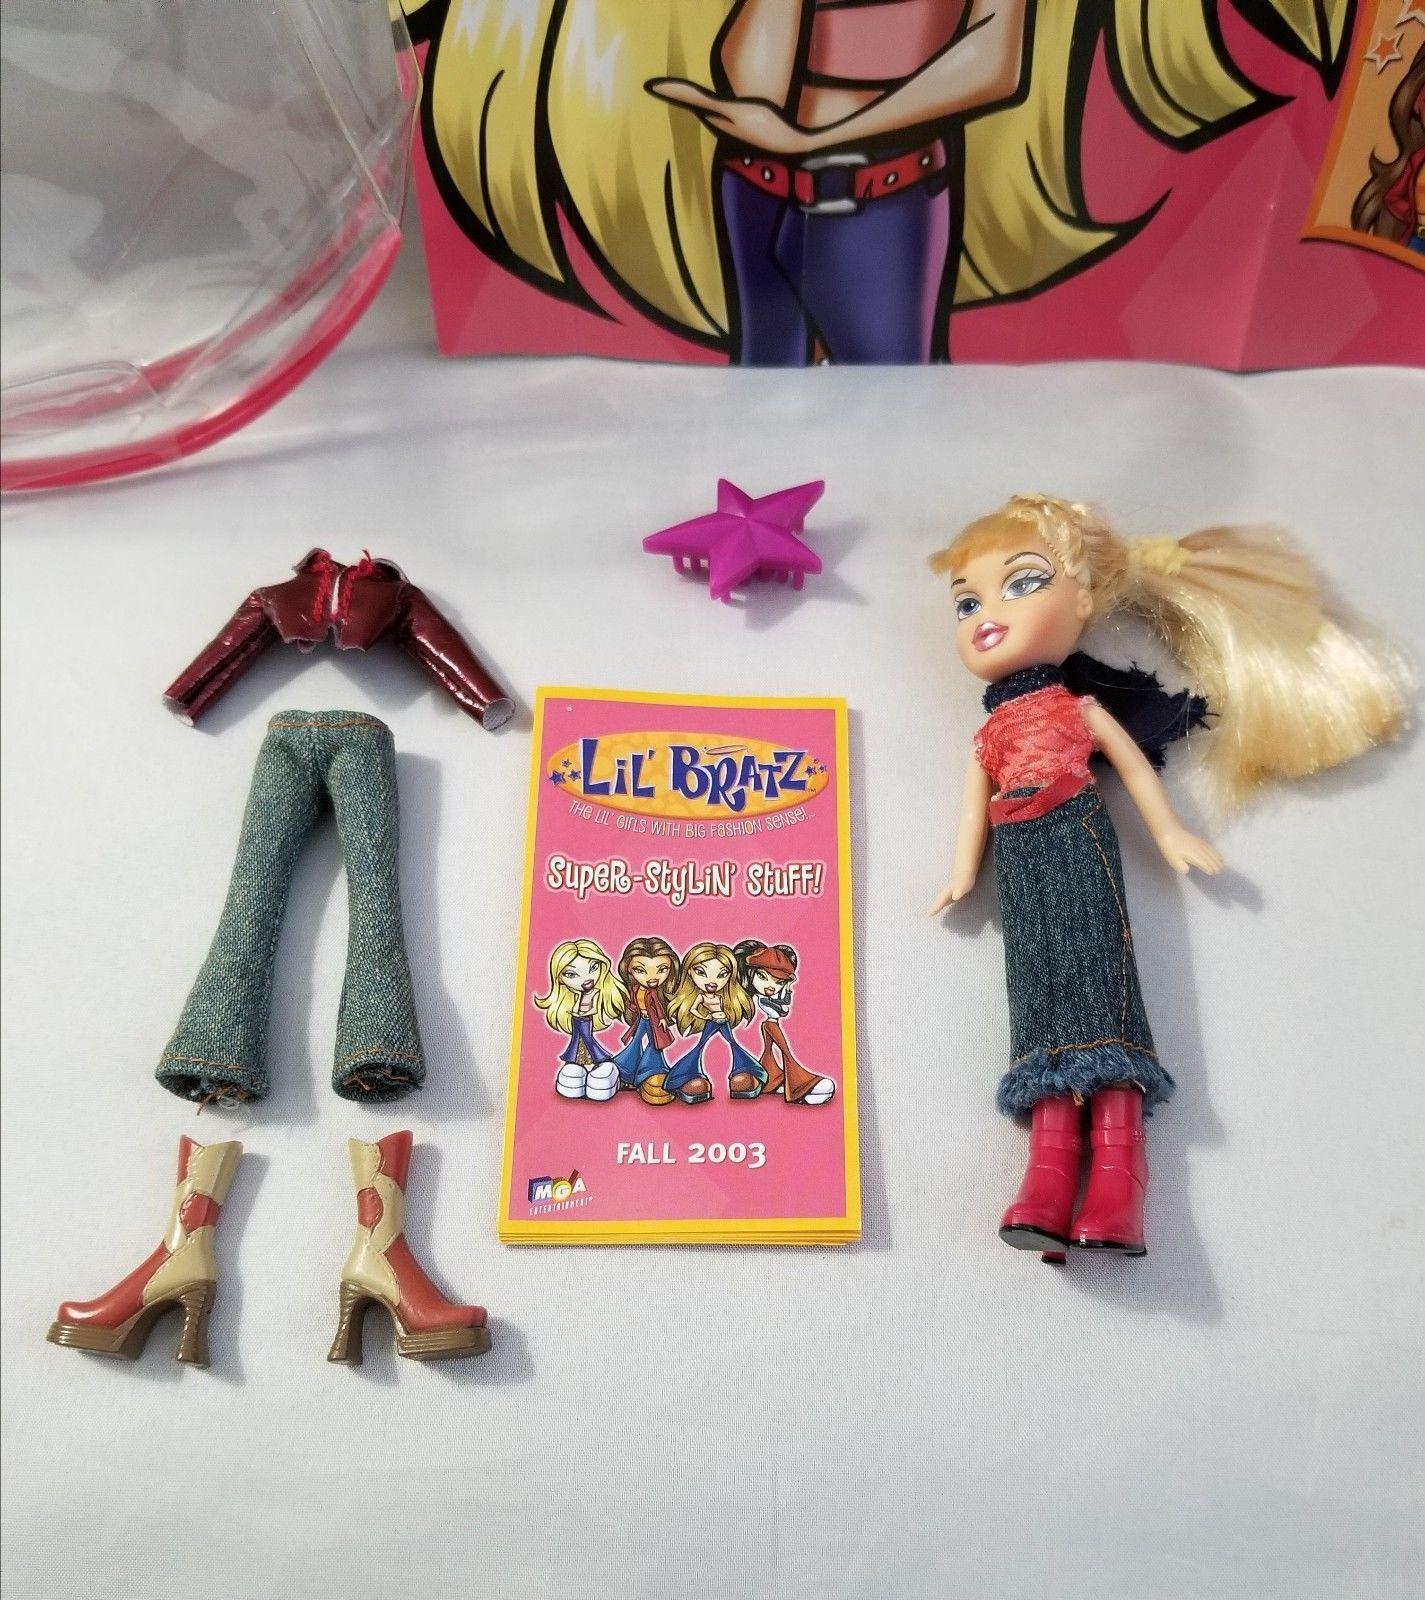 "MGA Lil Bratz Girls Mini Cloe Doll 4.5"" Fashion Accessory Play Toy Storage Bag"